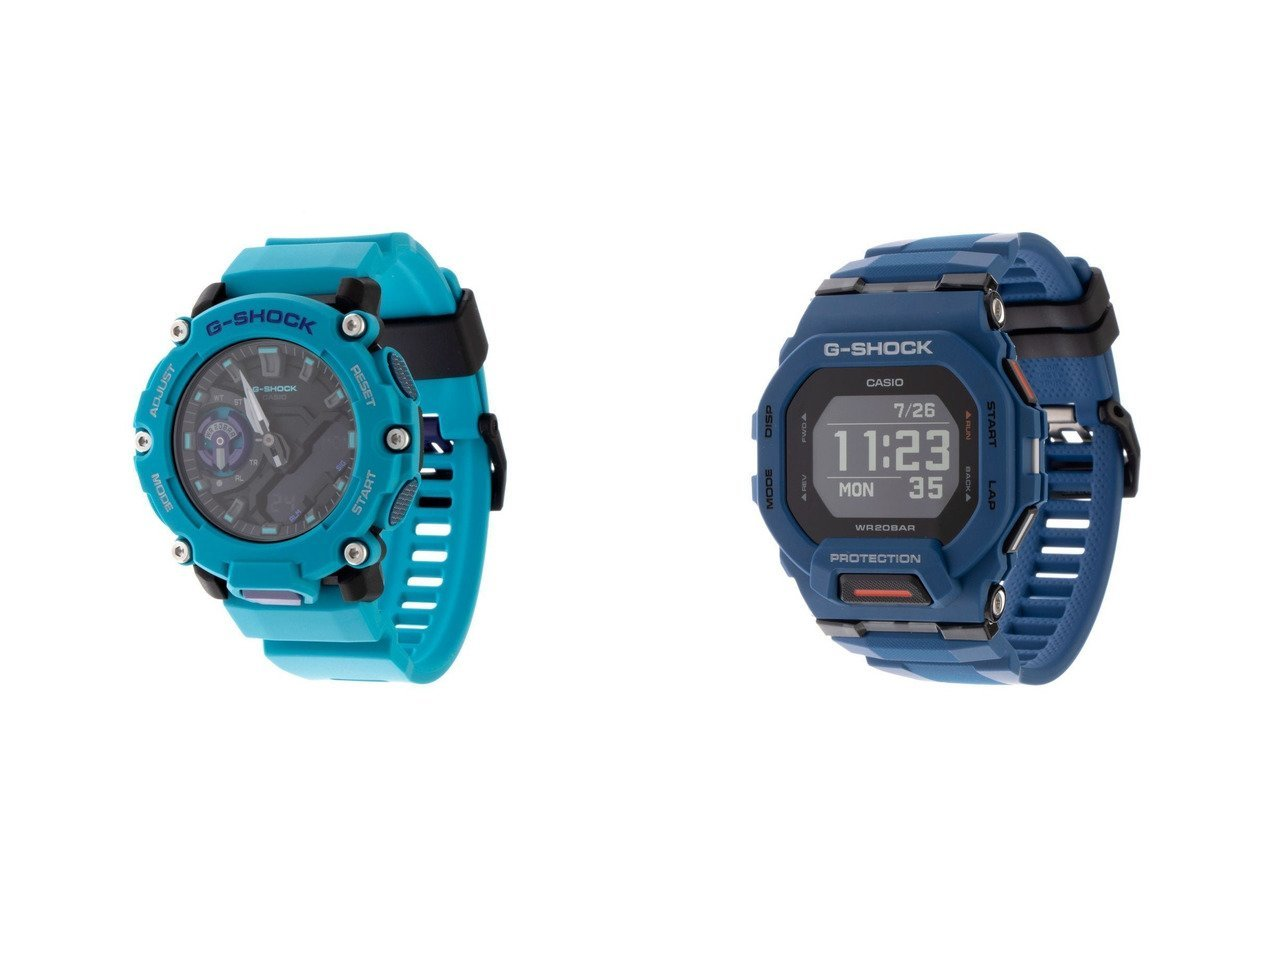 【G-SHOCK/G-ショック】のG-ジーショック 時計 GA-2200-2AJF&G-ジーショック 時計 GBD-200-2JF おすすめ!人気、トレンド・レディースファッションの通販 おすすめで人気の流行・トレンド、ファッションの通販商品 インテリア・家具・メンズファッション・キッズファッション・レディースファッション・服の通販 founy(ファニー) https://founy.com/ ファッション Fashion レディースファッション WOMEN 春 Spring ガラス 切替 軽量 スタンダード スリム ダブル 時計 2021年 2021 S/S・春夏 SS・Spring/Summer 2021春夏・S/S SS/Spring/Summer/2021 夏 Summer |ID:crp329100000062477